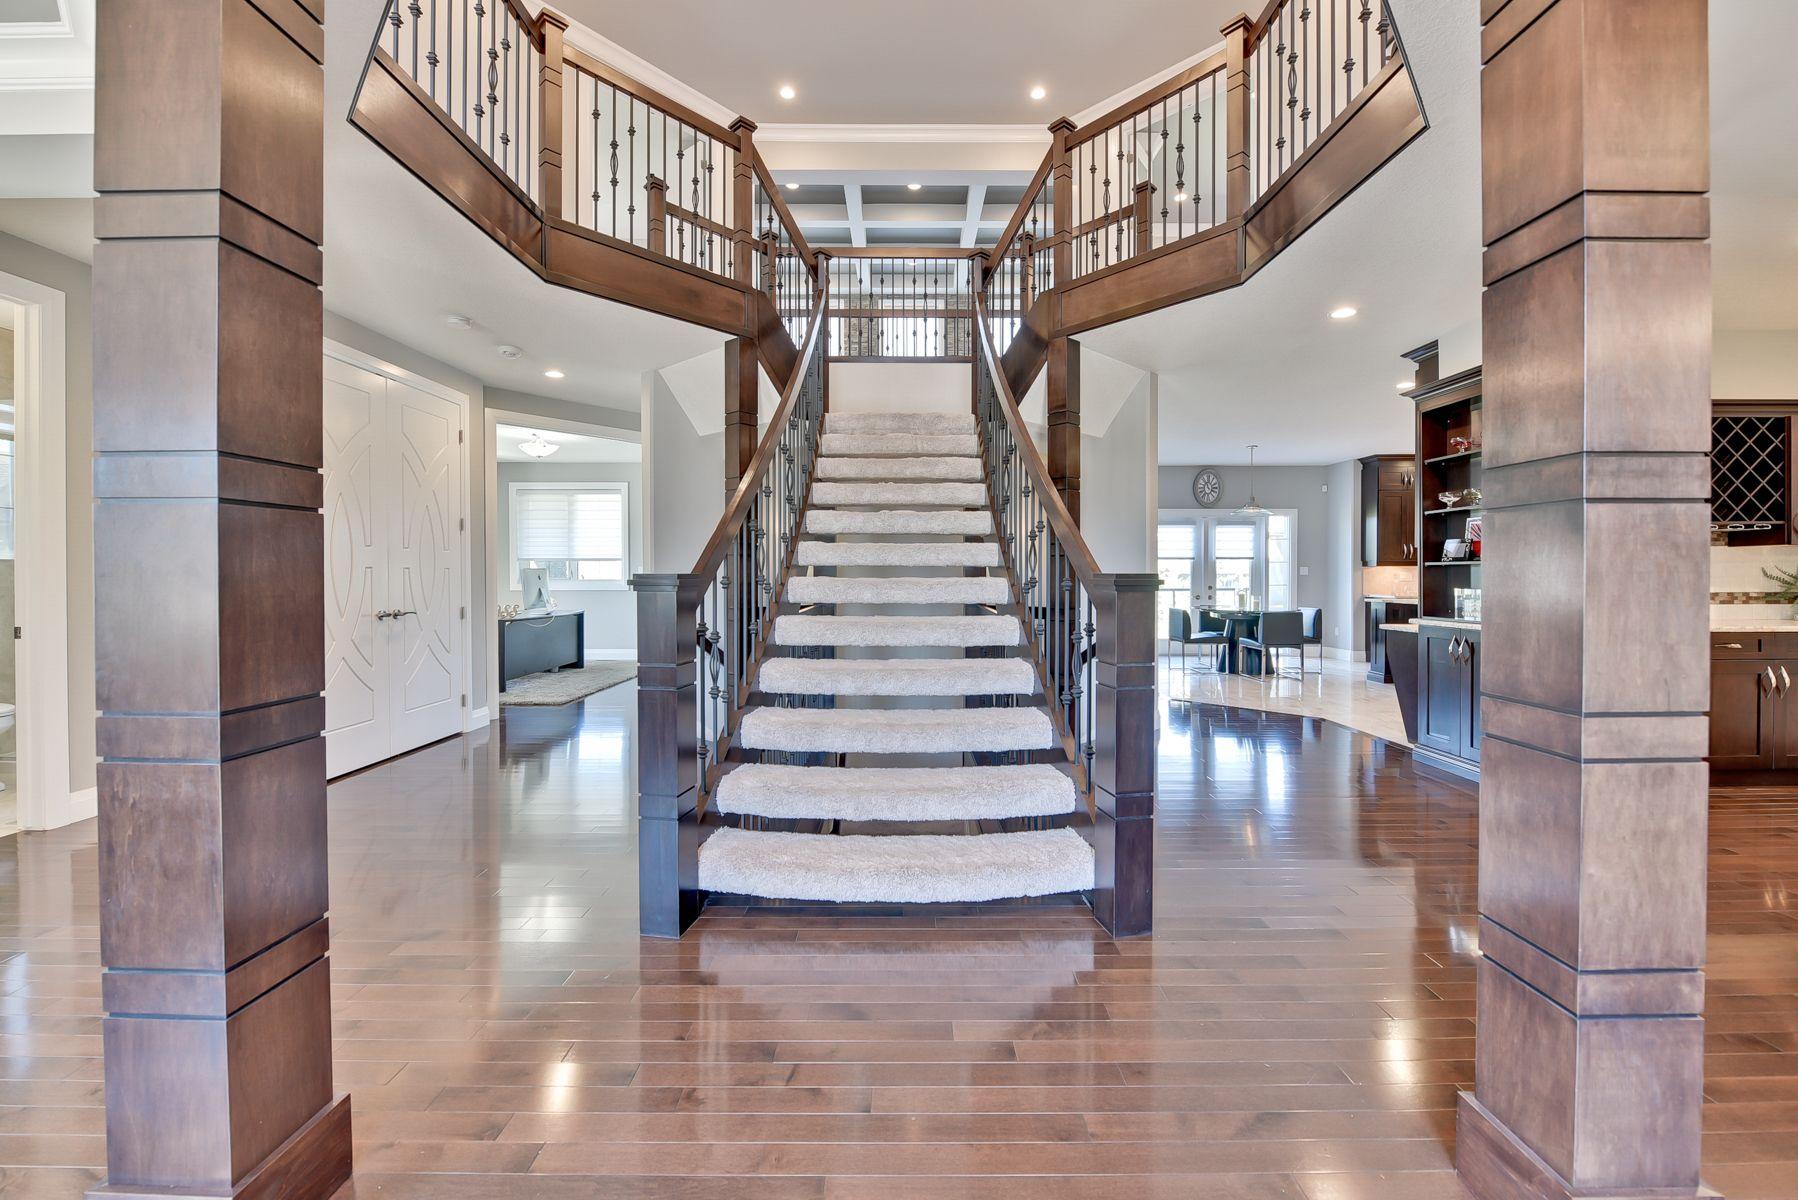 Main Photo: 4904 MacTaggart Court: Edmonton House for sale : MLS®# E4113625